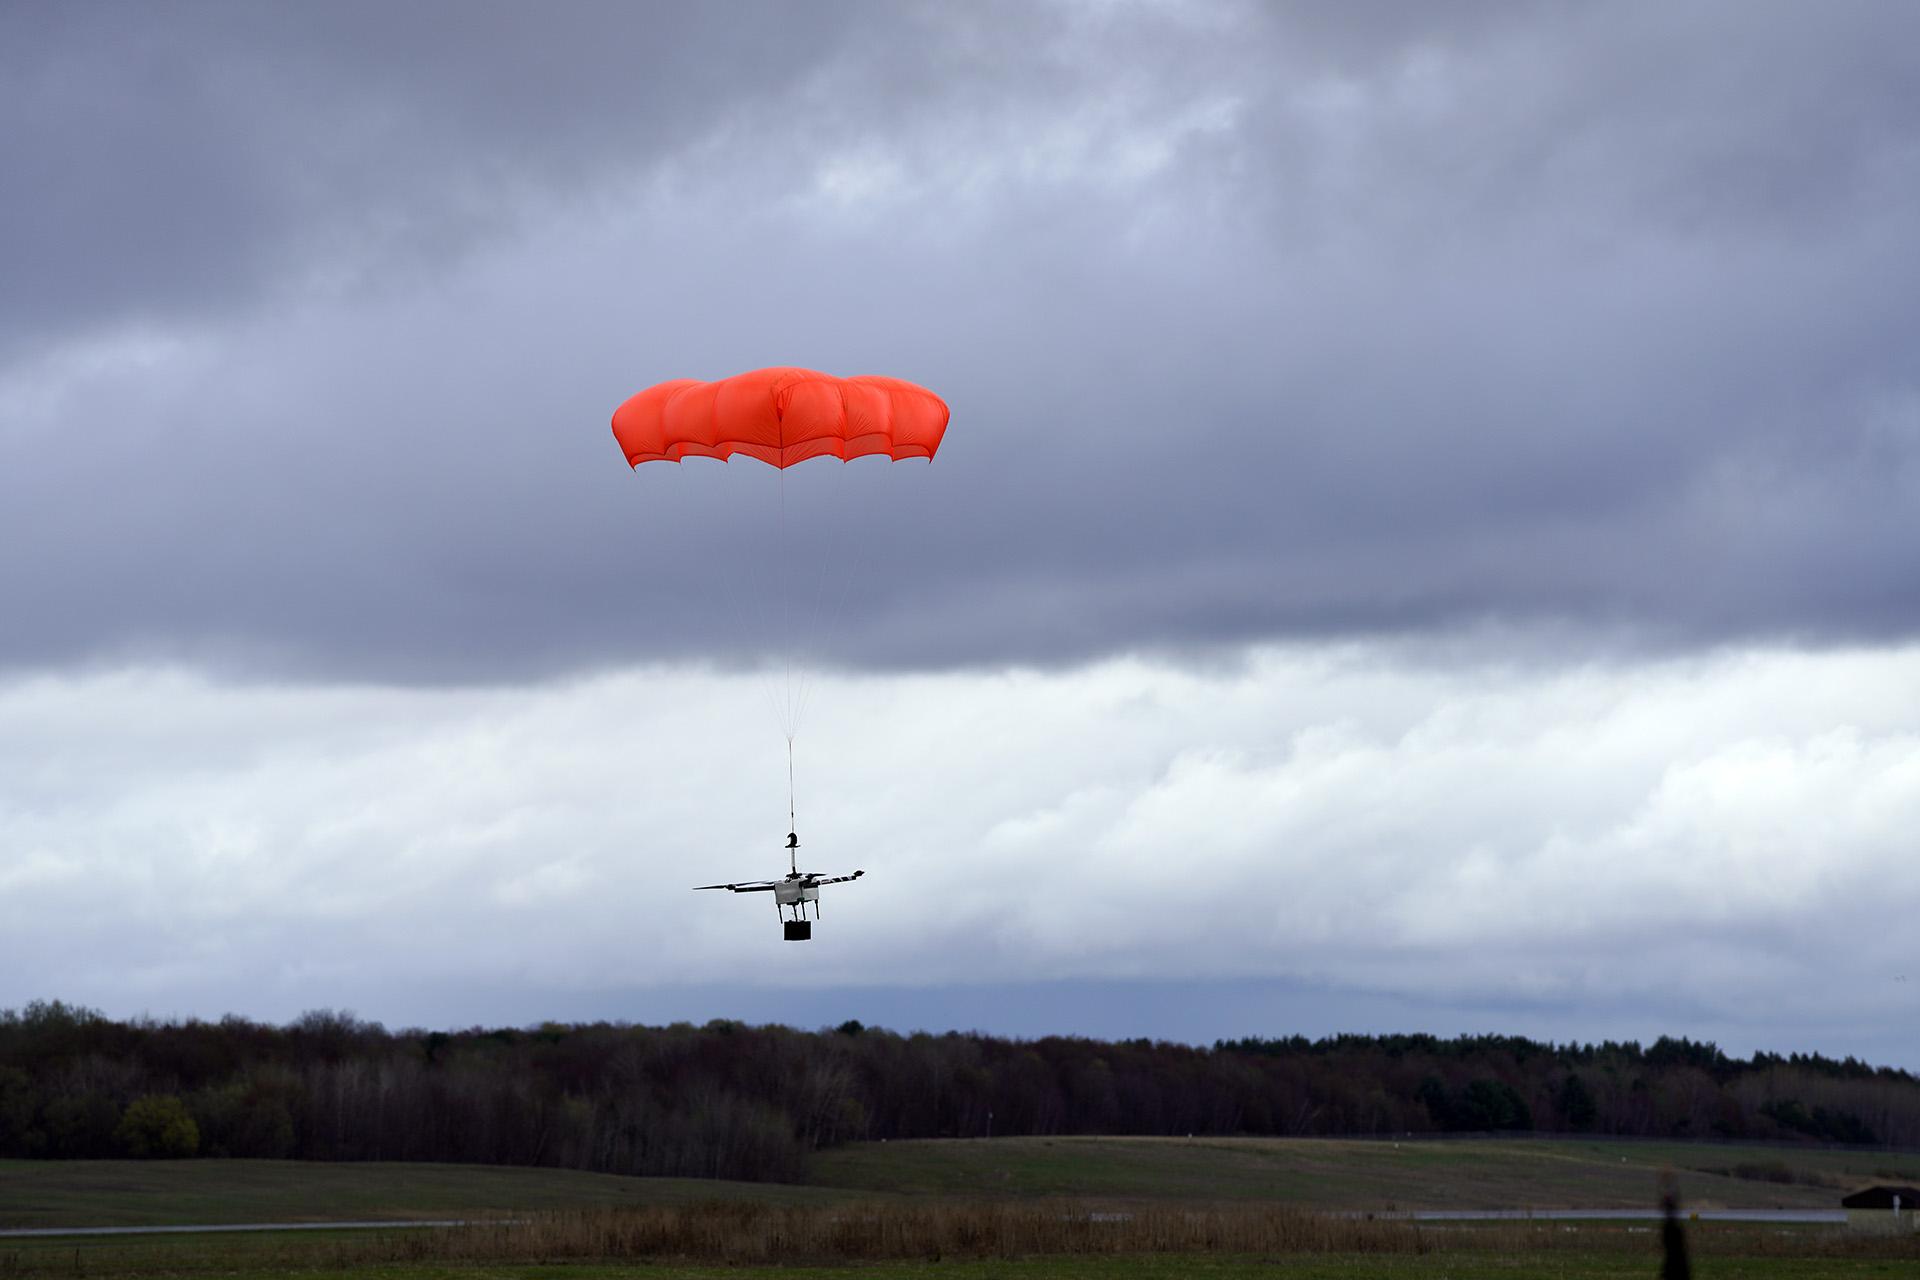 AVSS Parachute Deployed